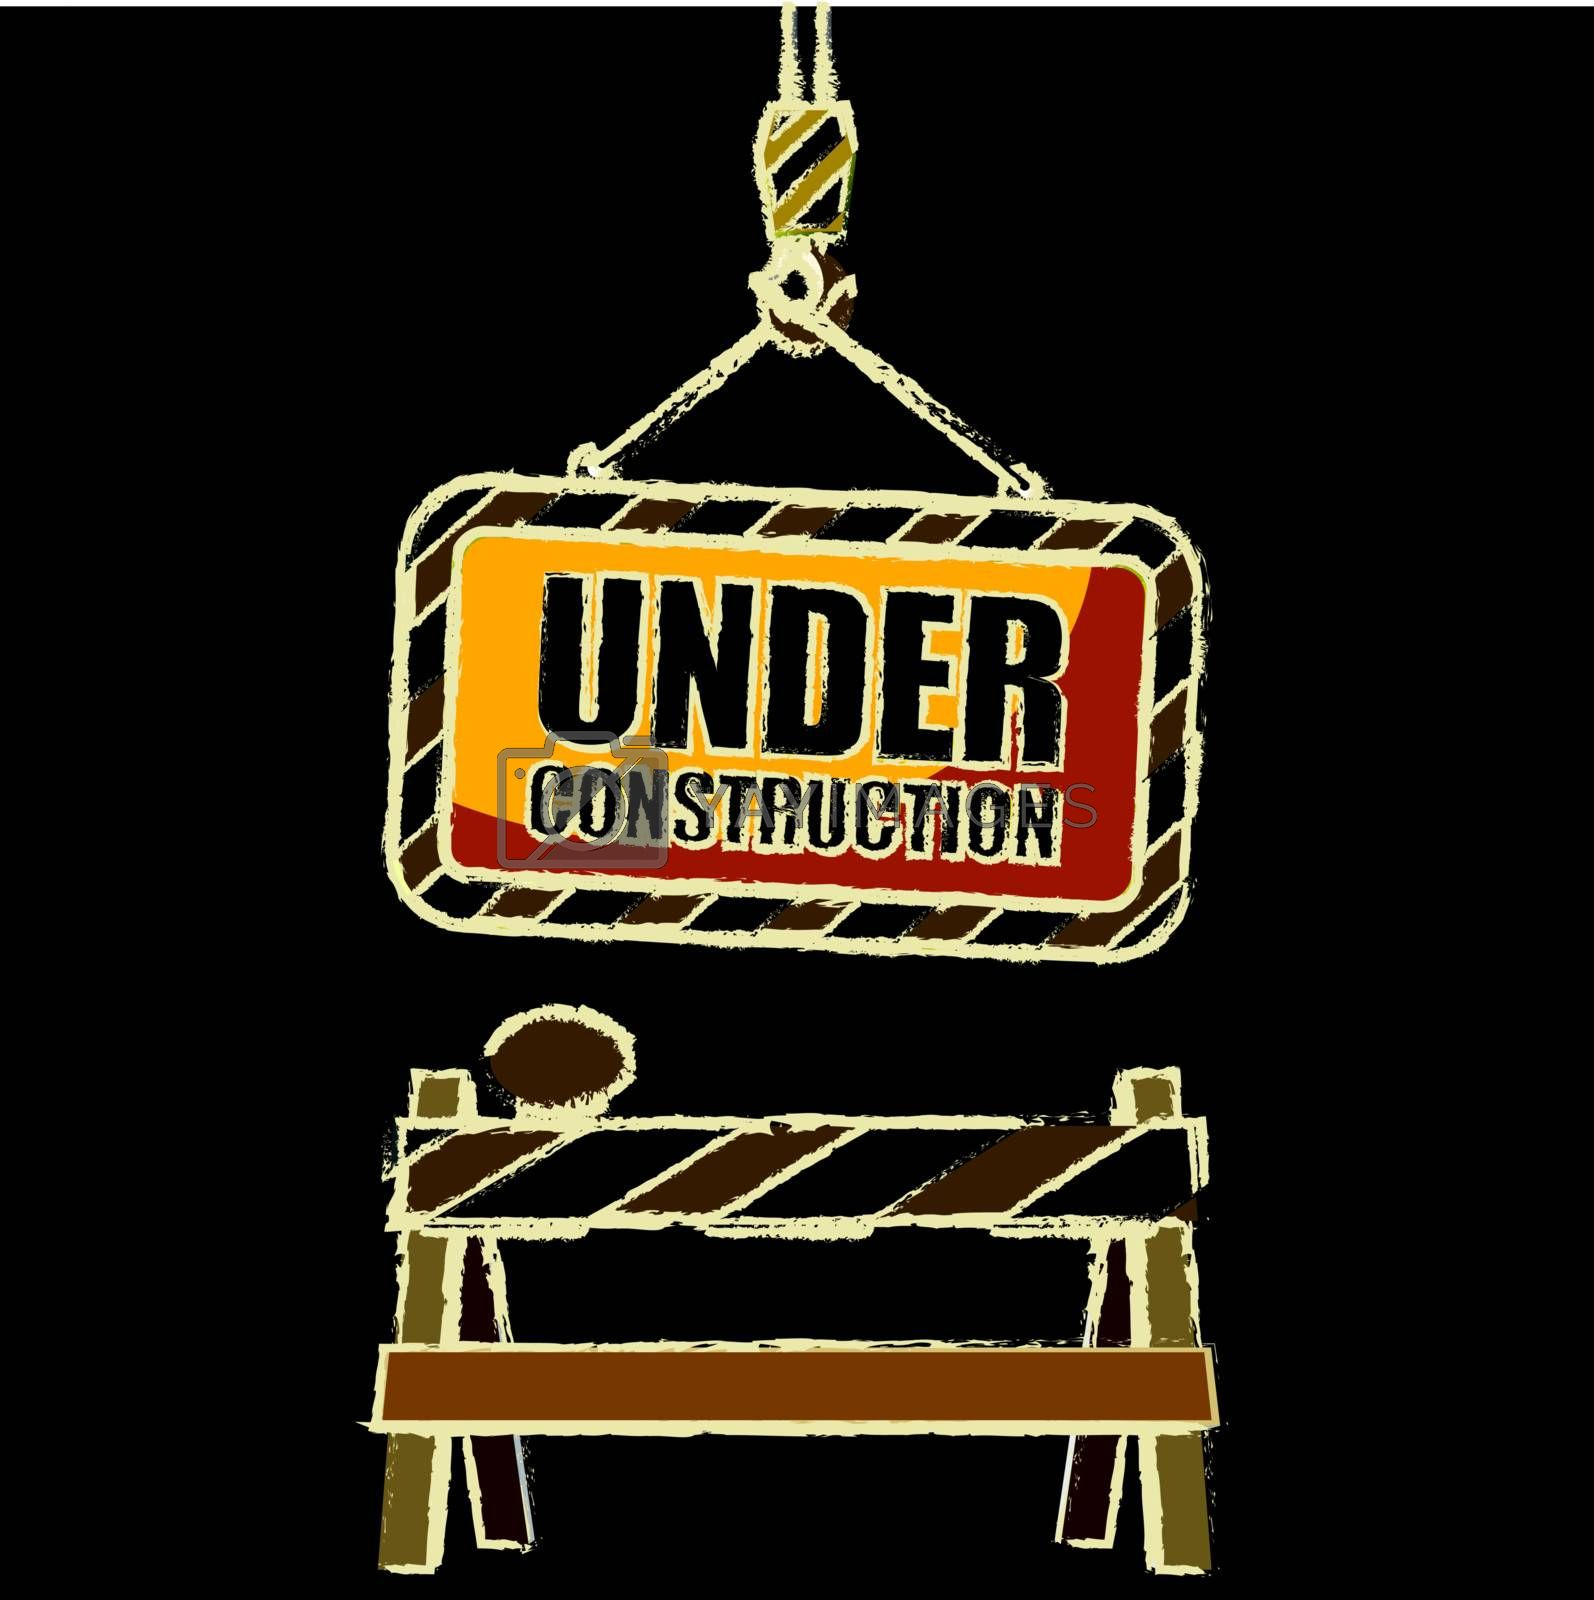 under construction with Grunge